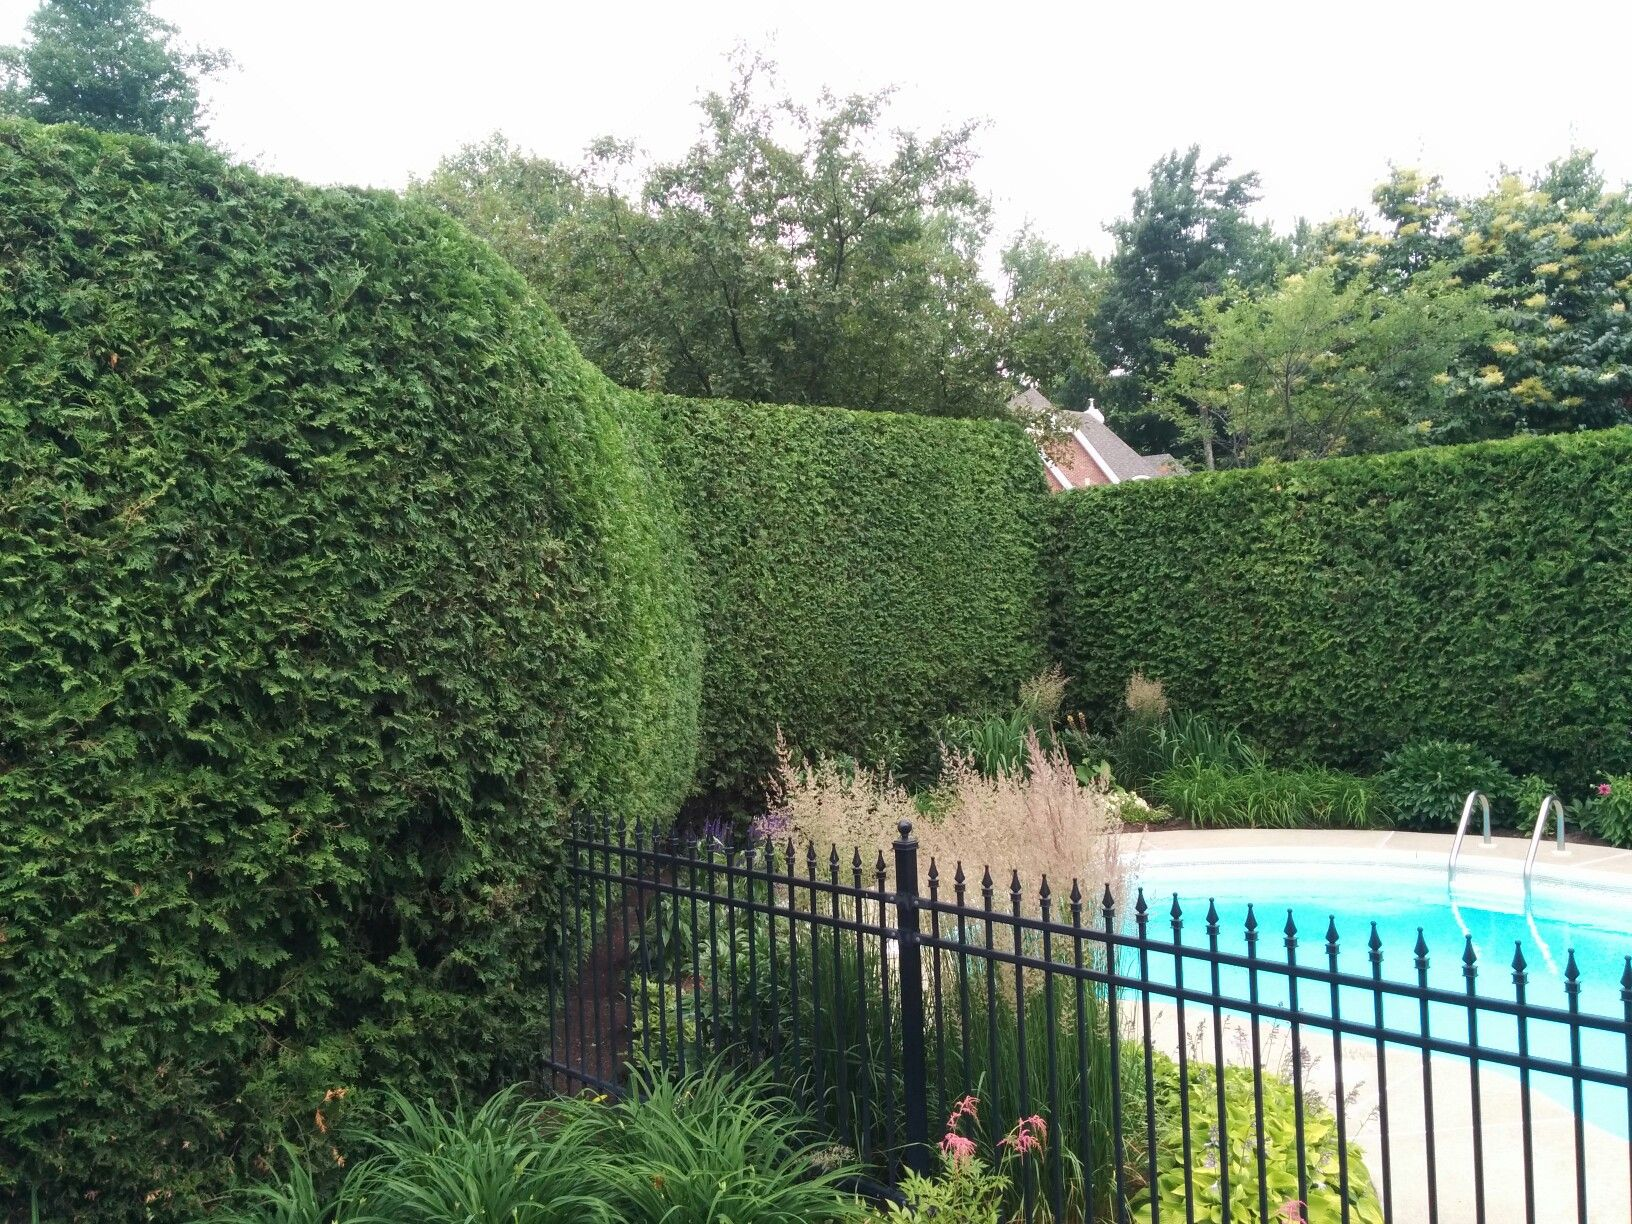 Hedges, Shrubs, Human Height